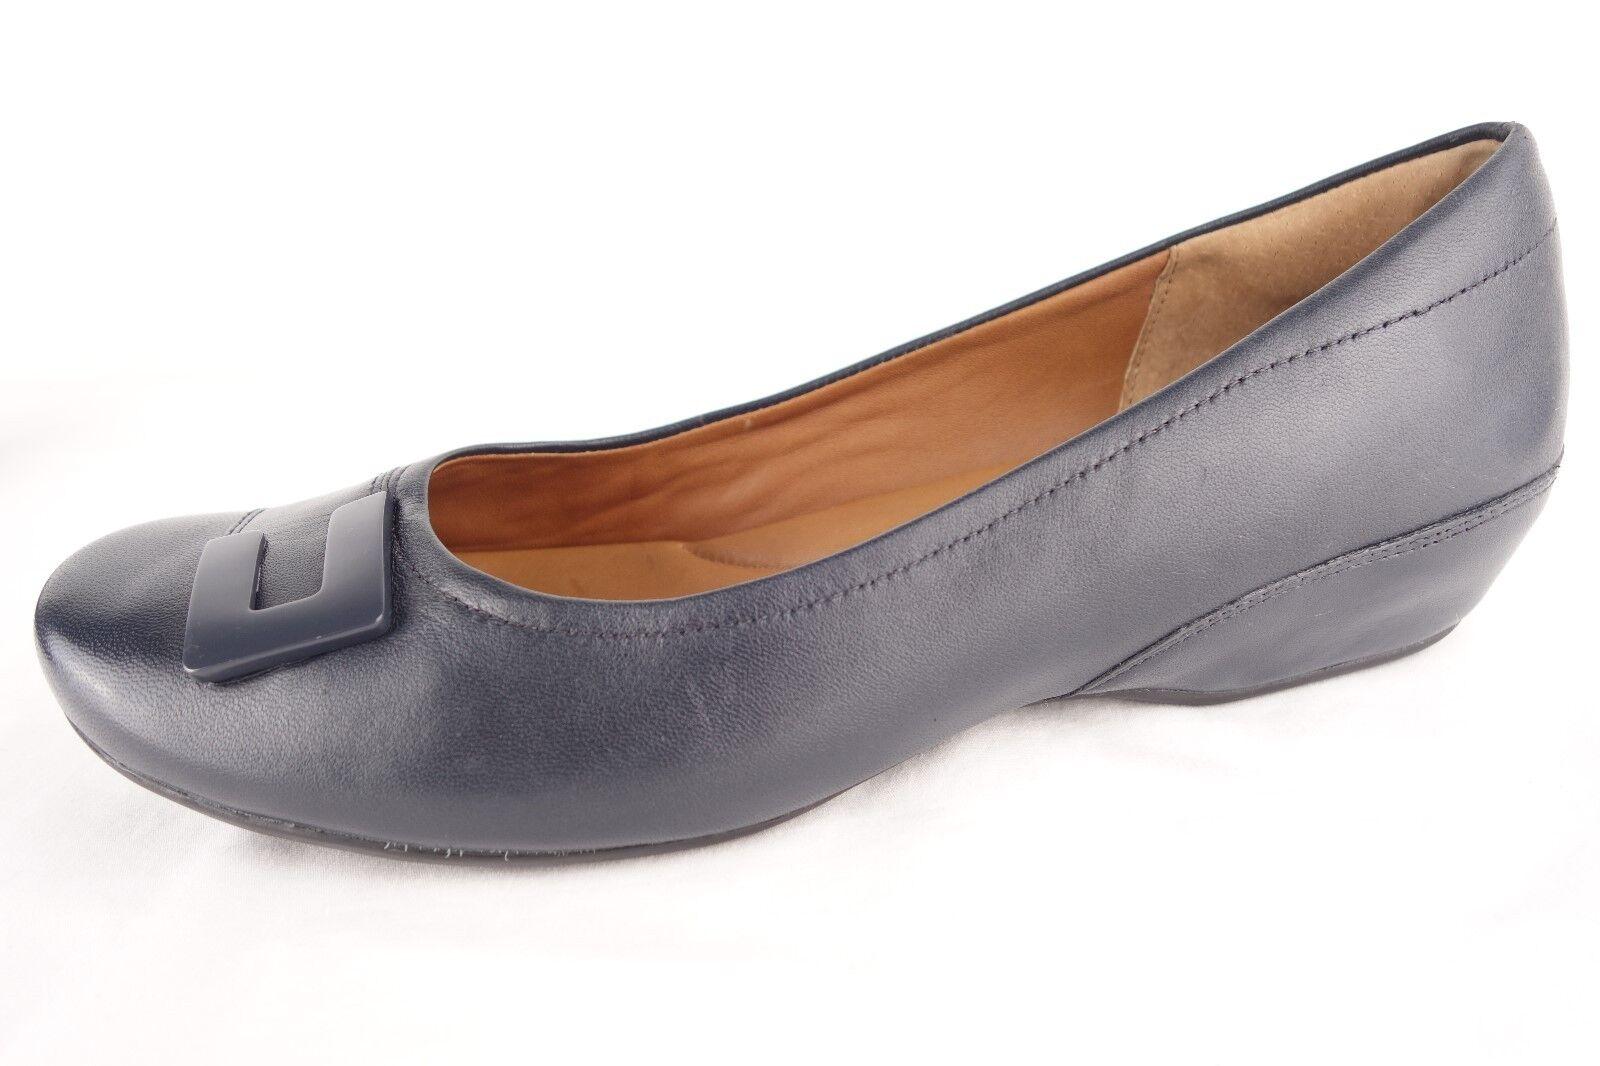 Clarks Artisan Zapatos Azul Cuero Zapatos Bajos Zapatos Artisan Mocasines Mujer 8 0b680e